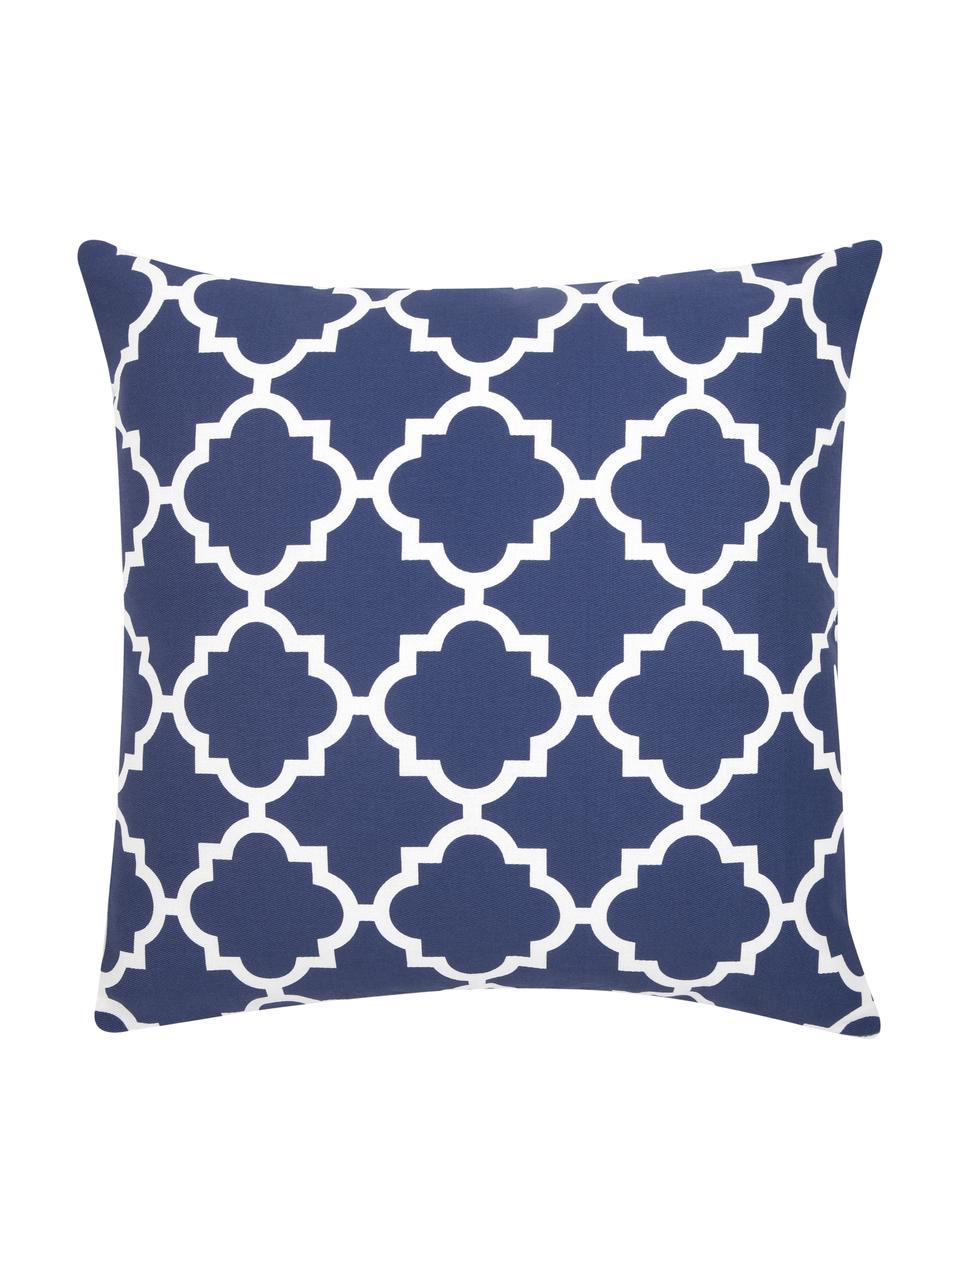 Federa arredo con motivo grafico Lana, 100% cotone, Blu marino, bianco, Larg. 45 x Lung. 45 cm